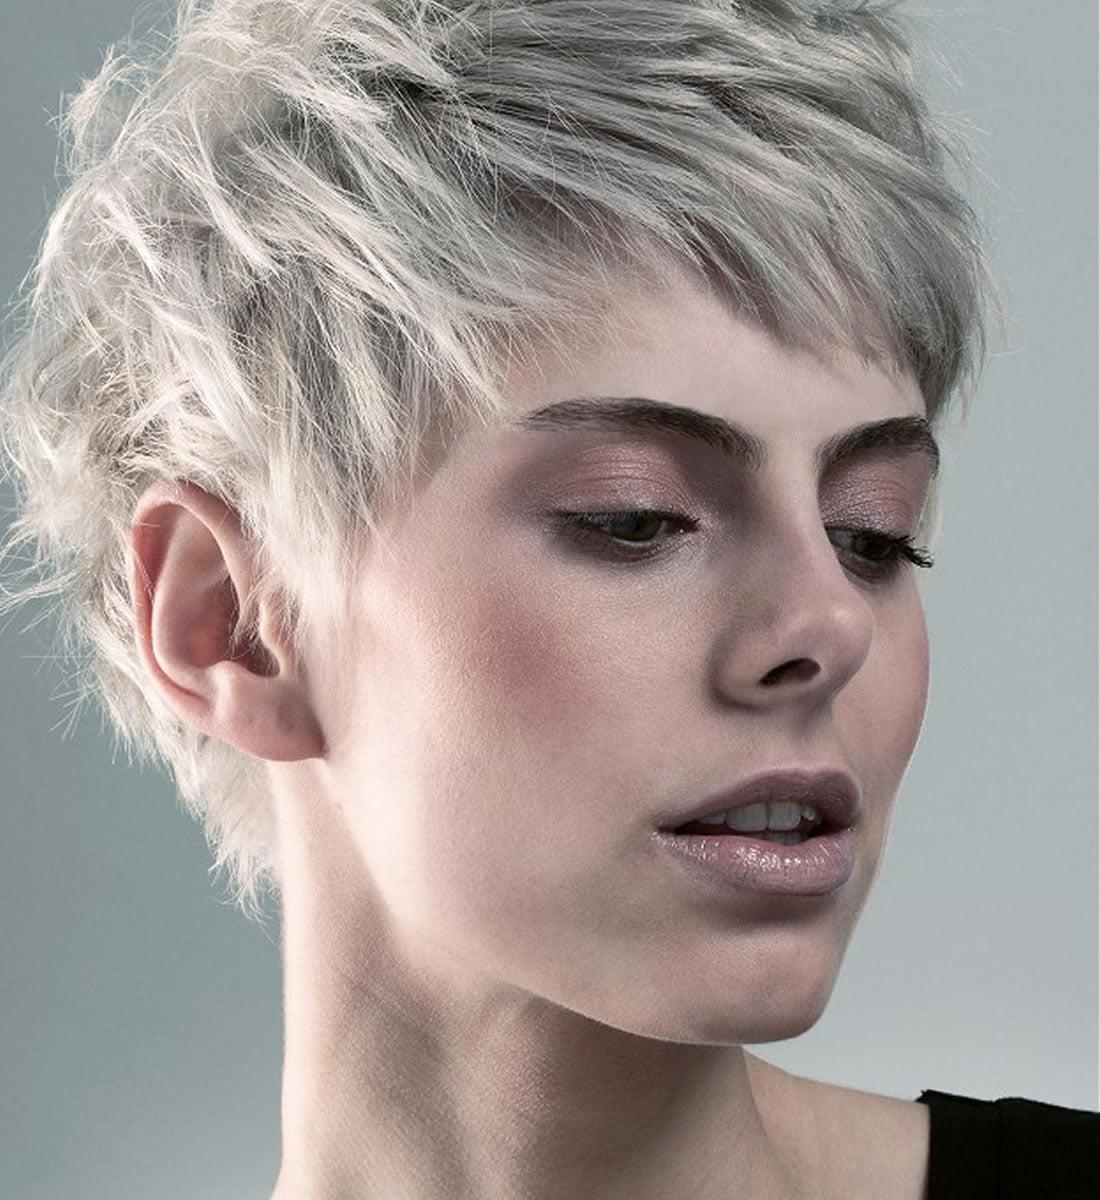 Platinum blonde hair color ideas for 2018-2019